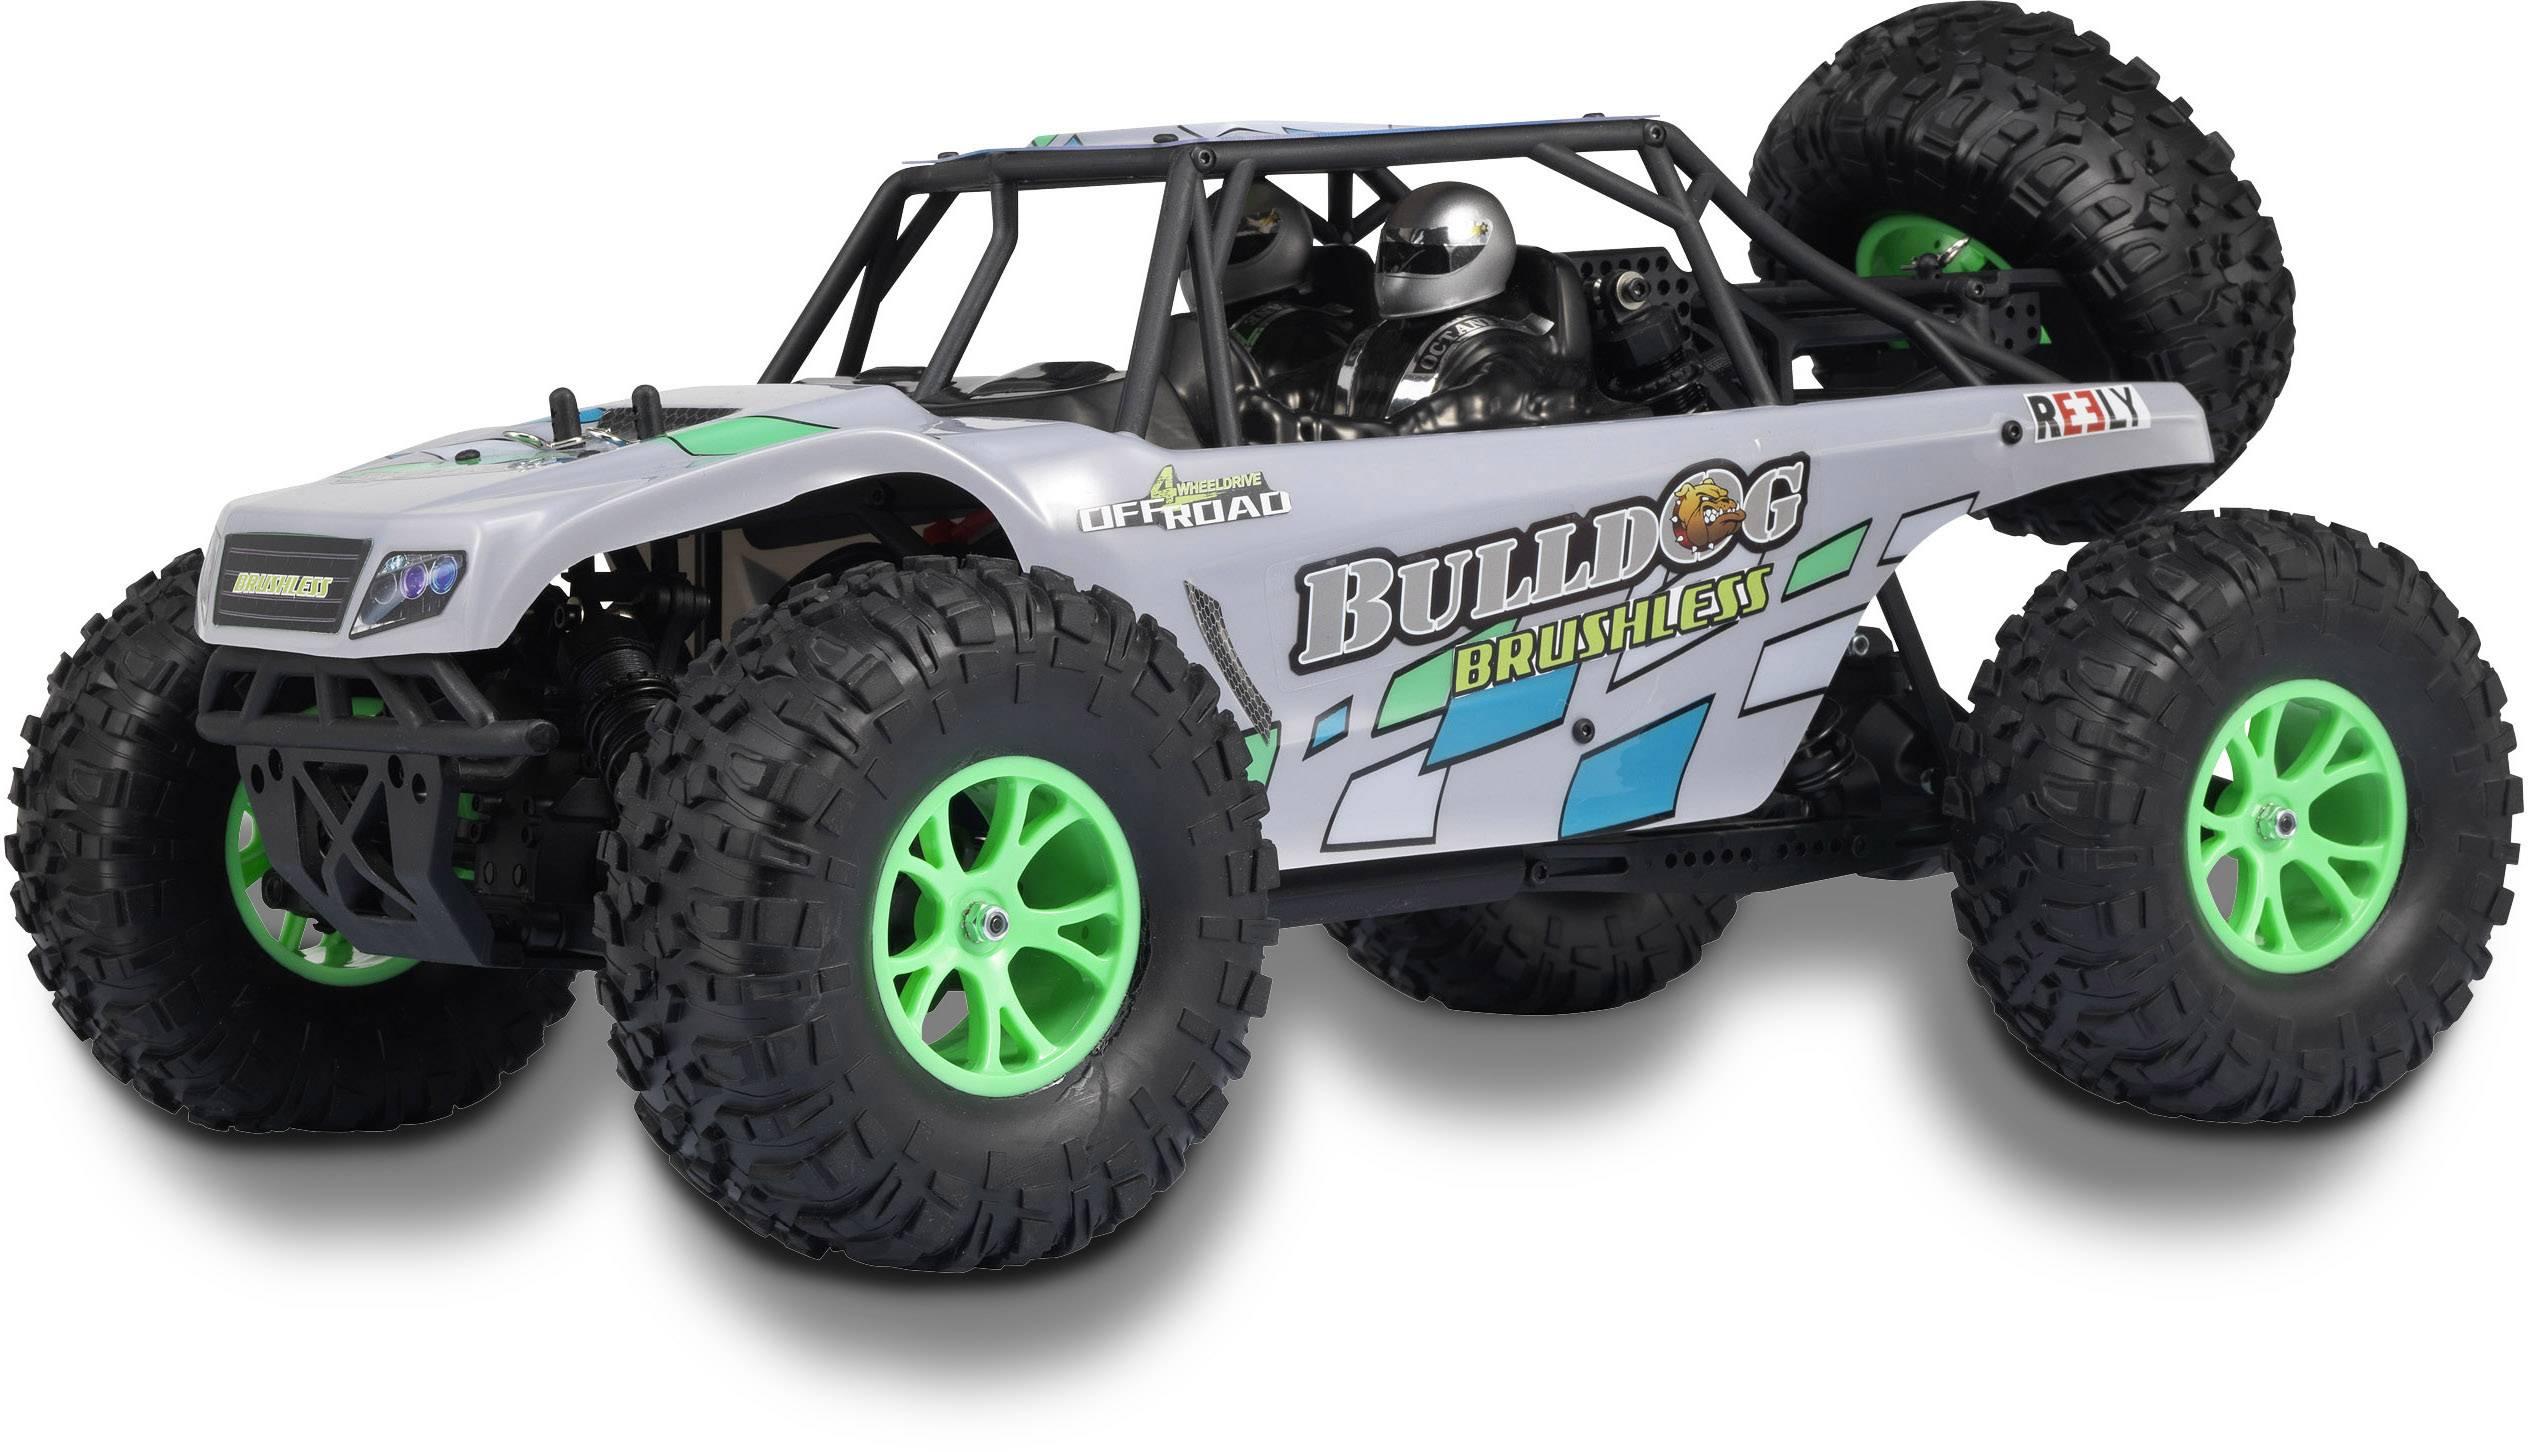 RC model auta Buggy Reely Bulldog 2S, střídavý (Brushless), 1:10, 4WD (4x4), RtR, 60 km/h